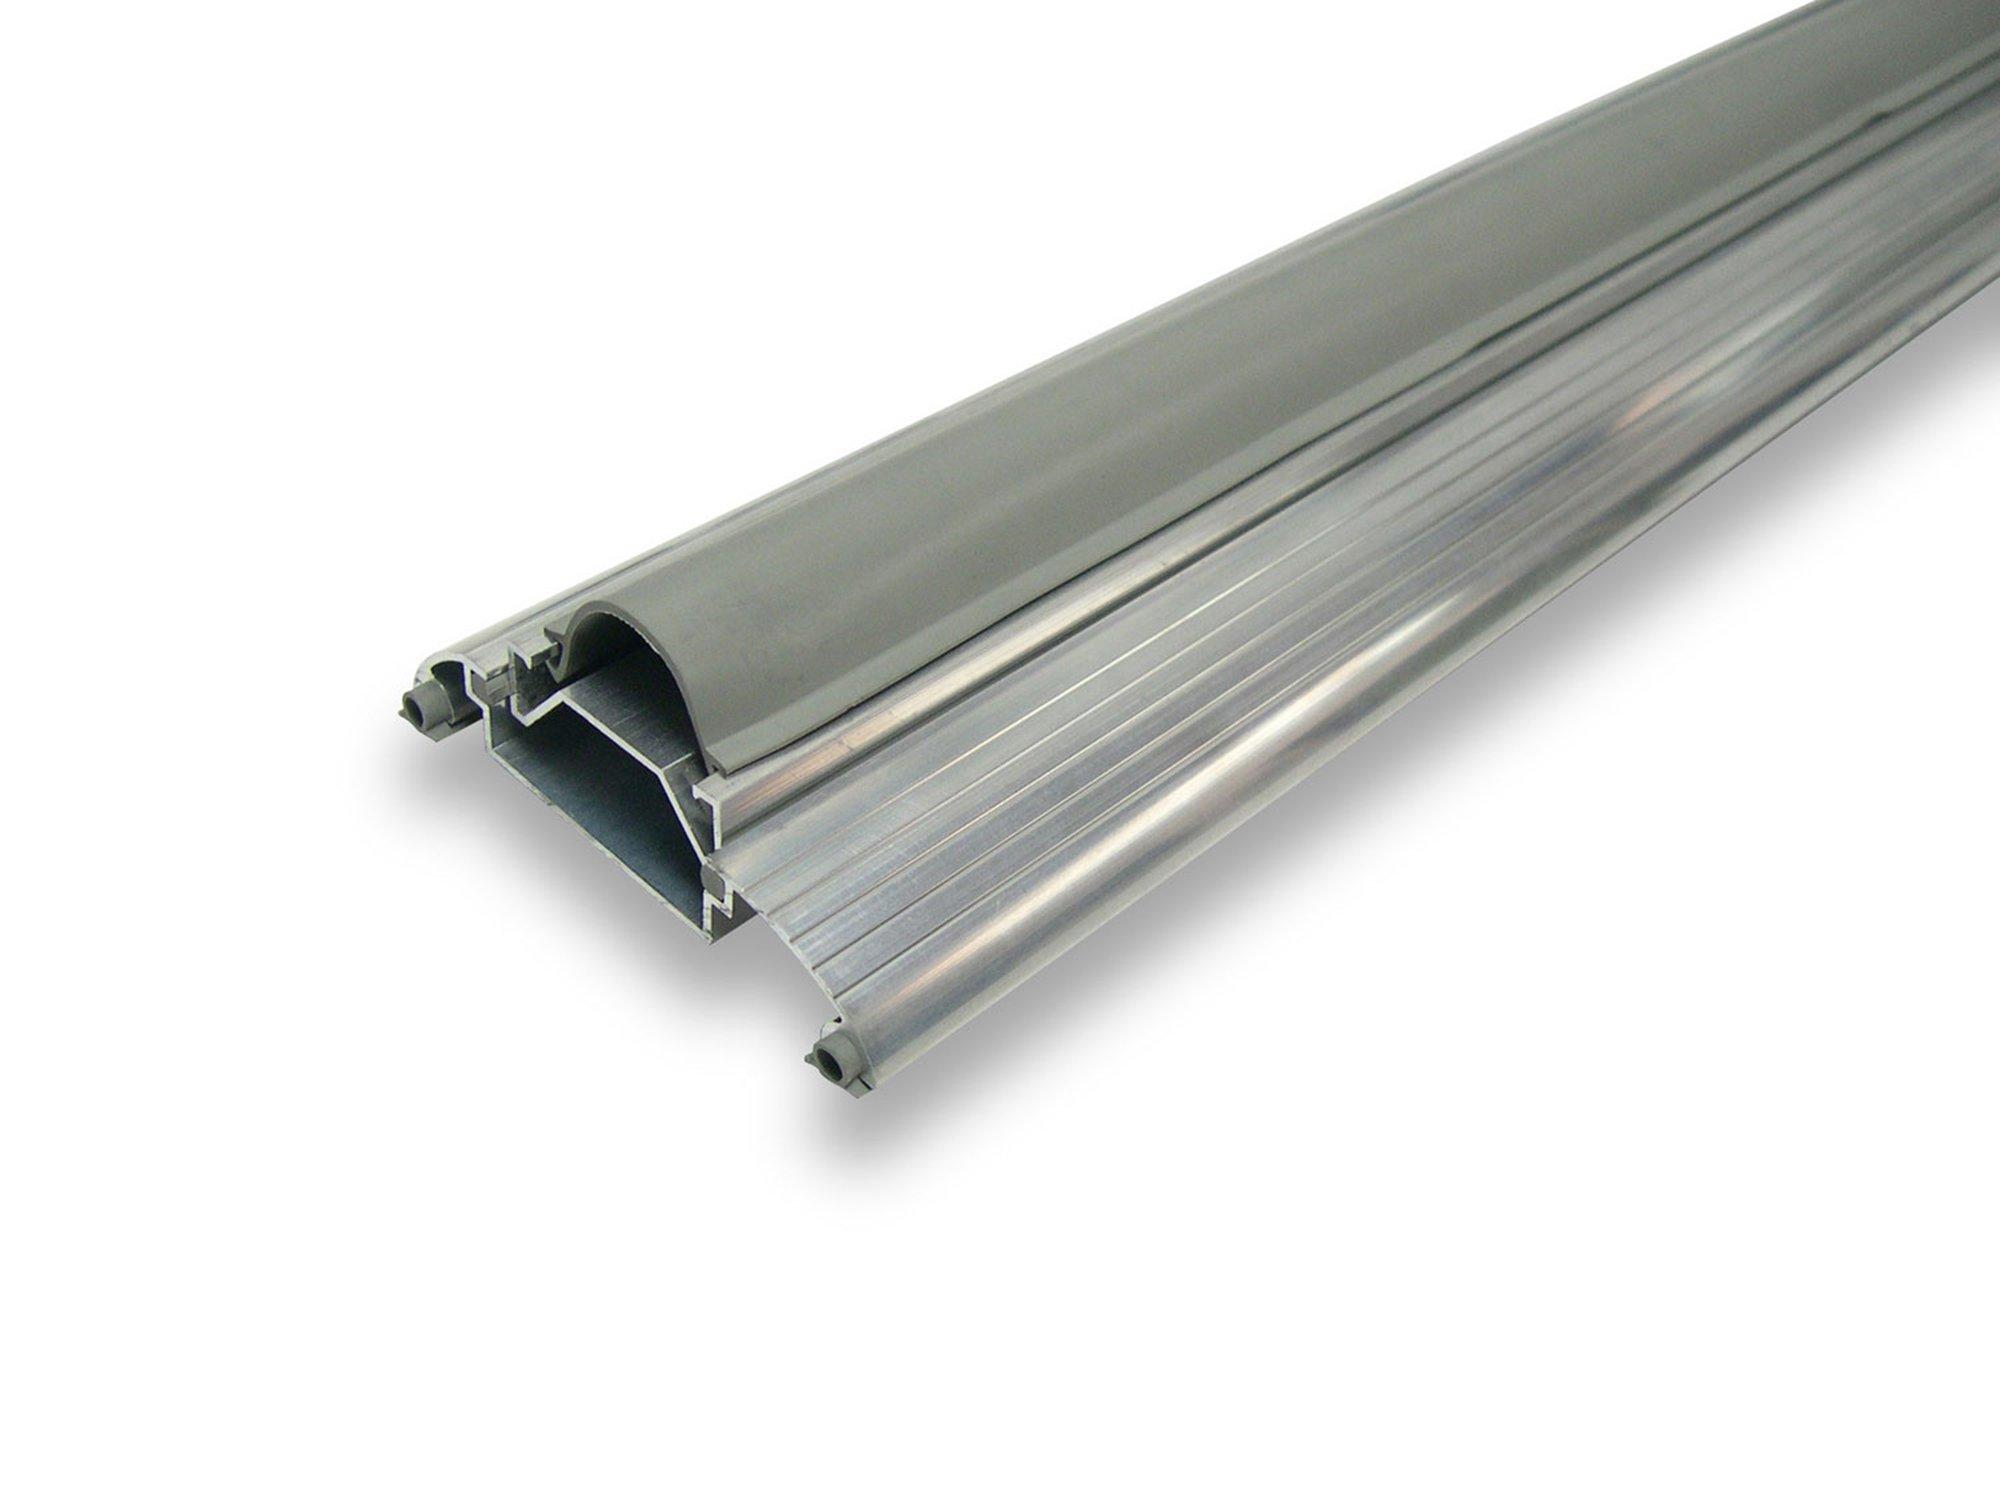 WJ Dennis & Company 653 Adjustable Threshold, 3 1/2-Inch W x 13/16-Inch-19/16-Inch H x 36 1/2-Inch L, Aluminum & Vinyl